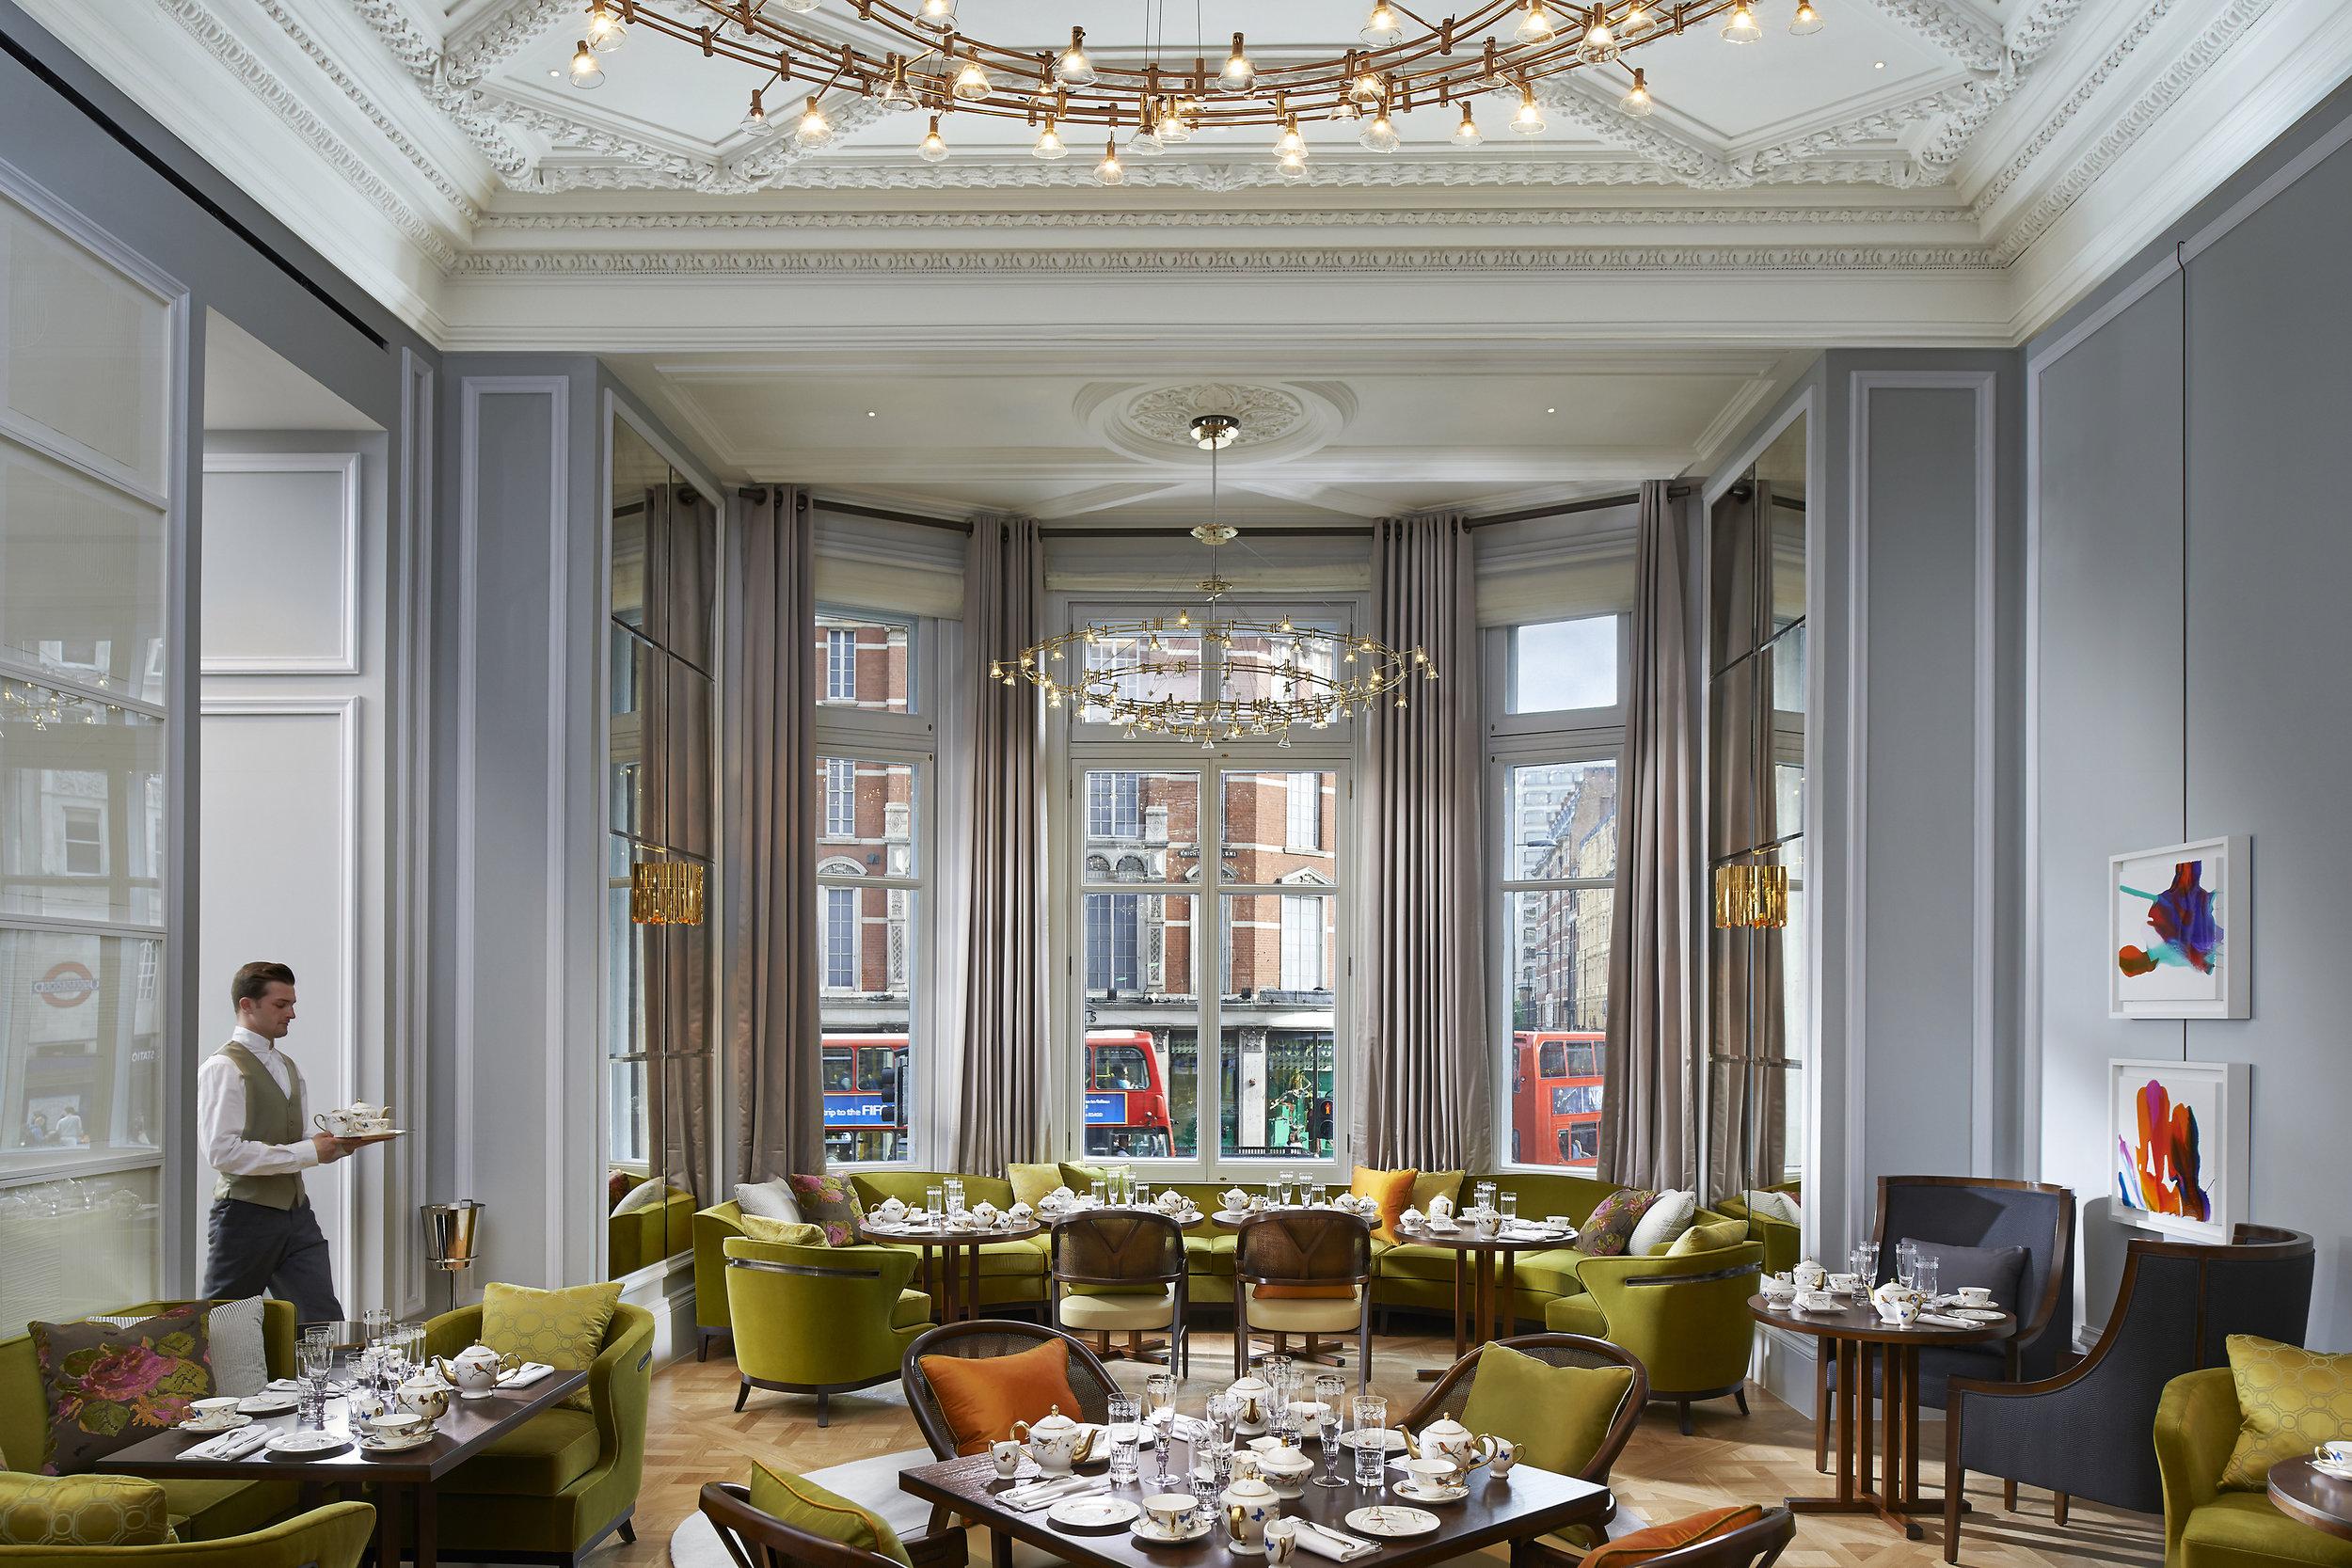 london-2014-fine-dining-rosebery-03-grid-height.jpg